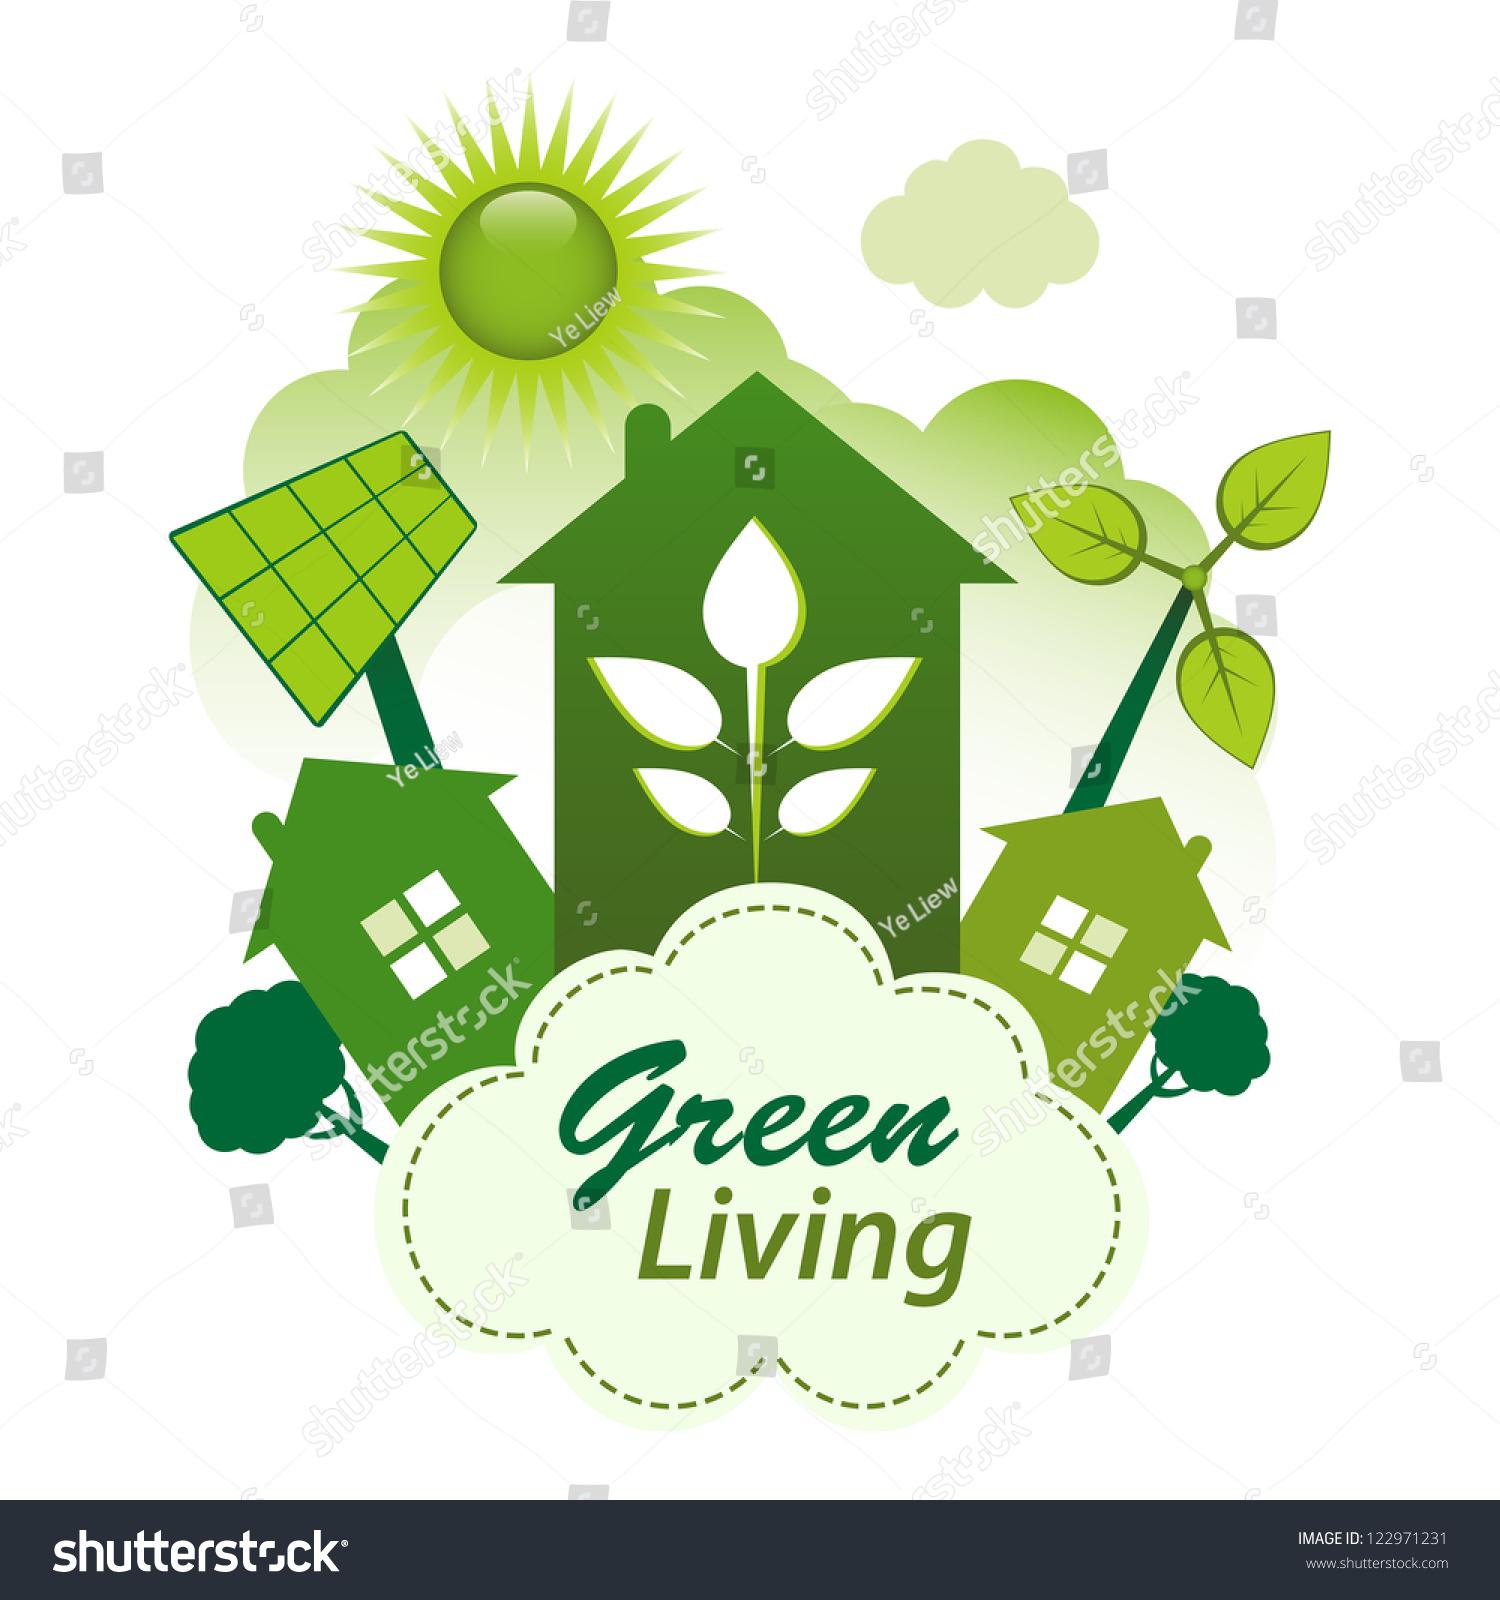 Briliant Green Living